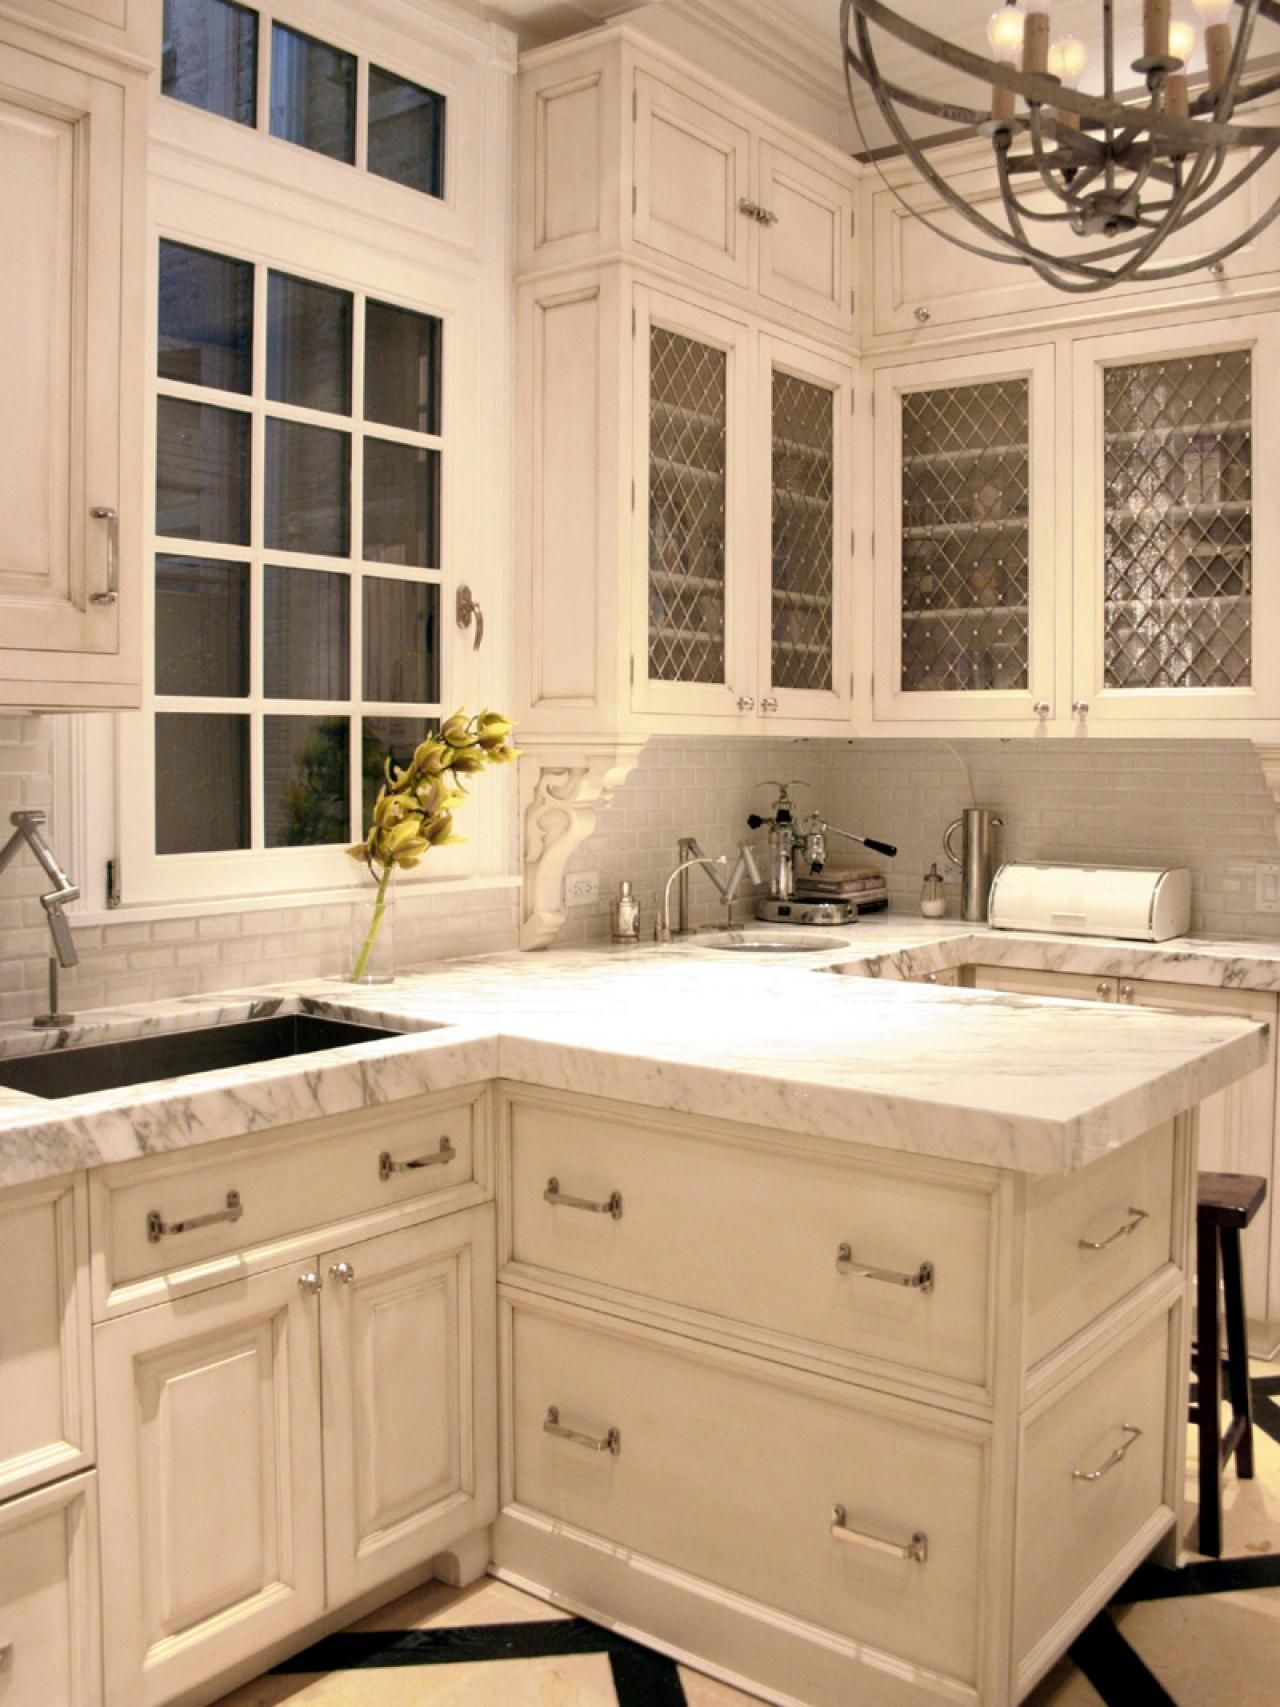 Kitchen Countertops: Beautiful, Functional Design Options